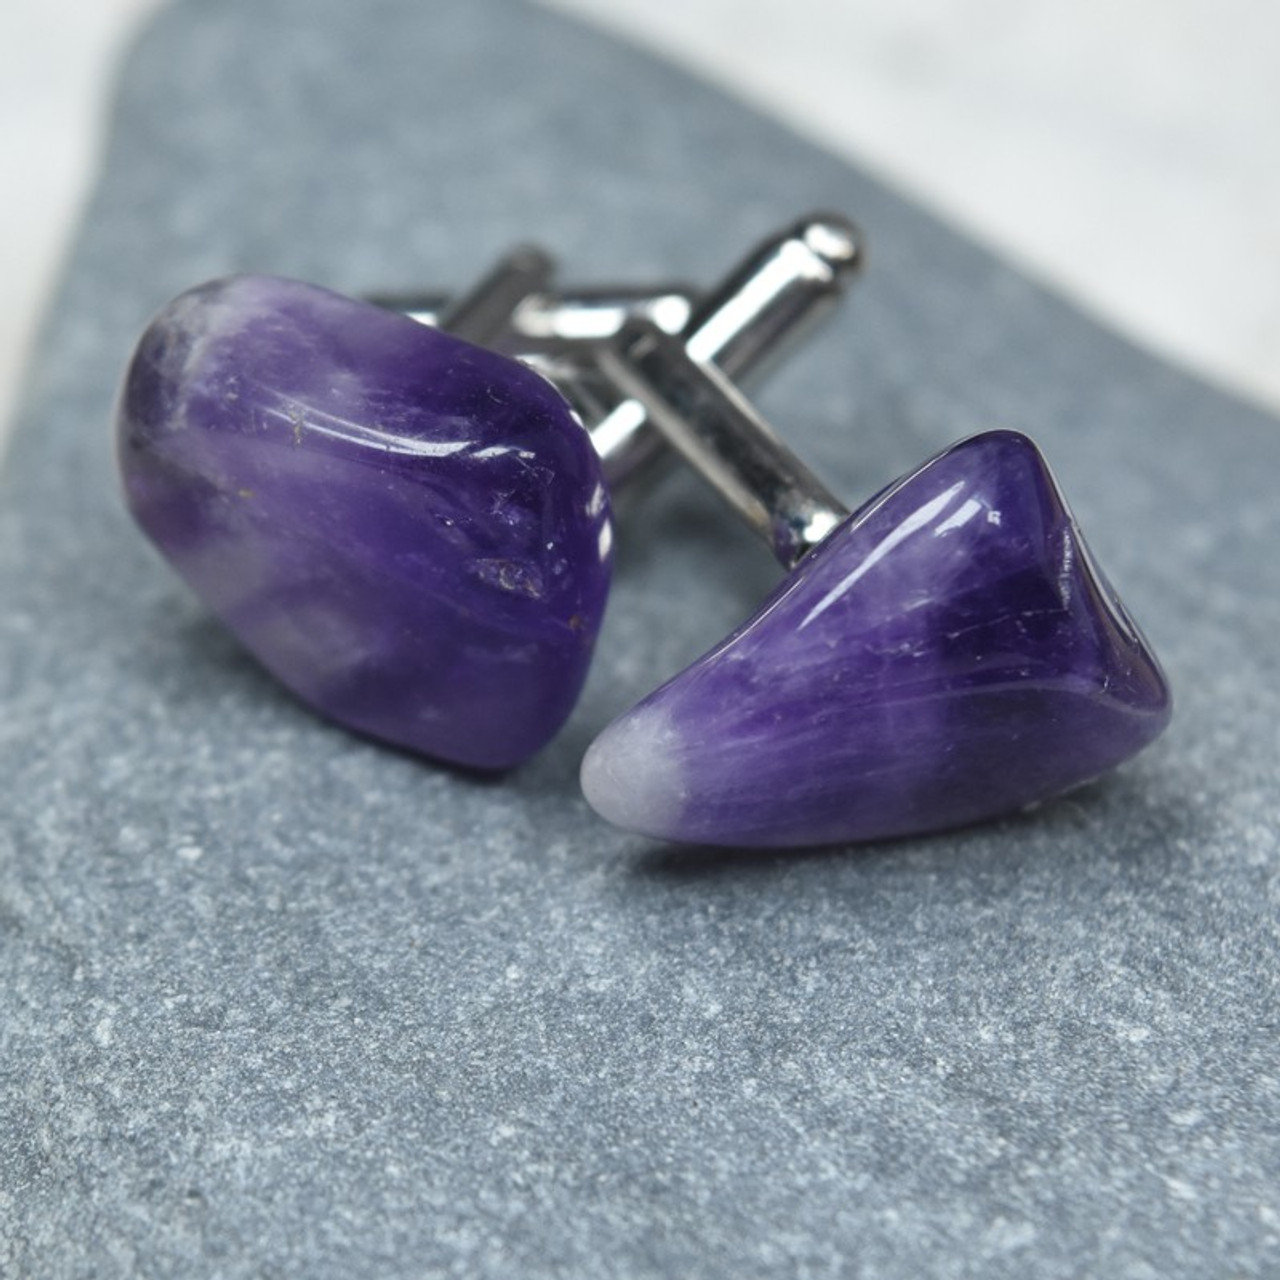 Custom Amethyst Stone Cufflinks Handmade - 1 Set